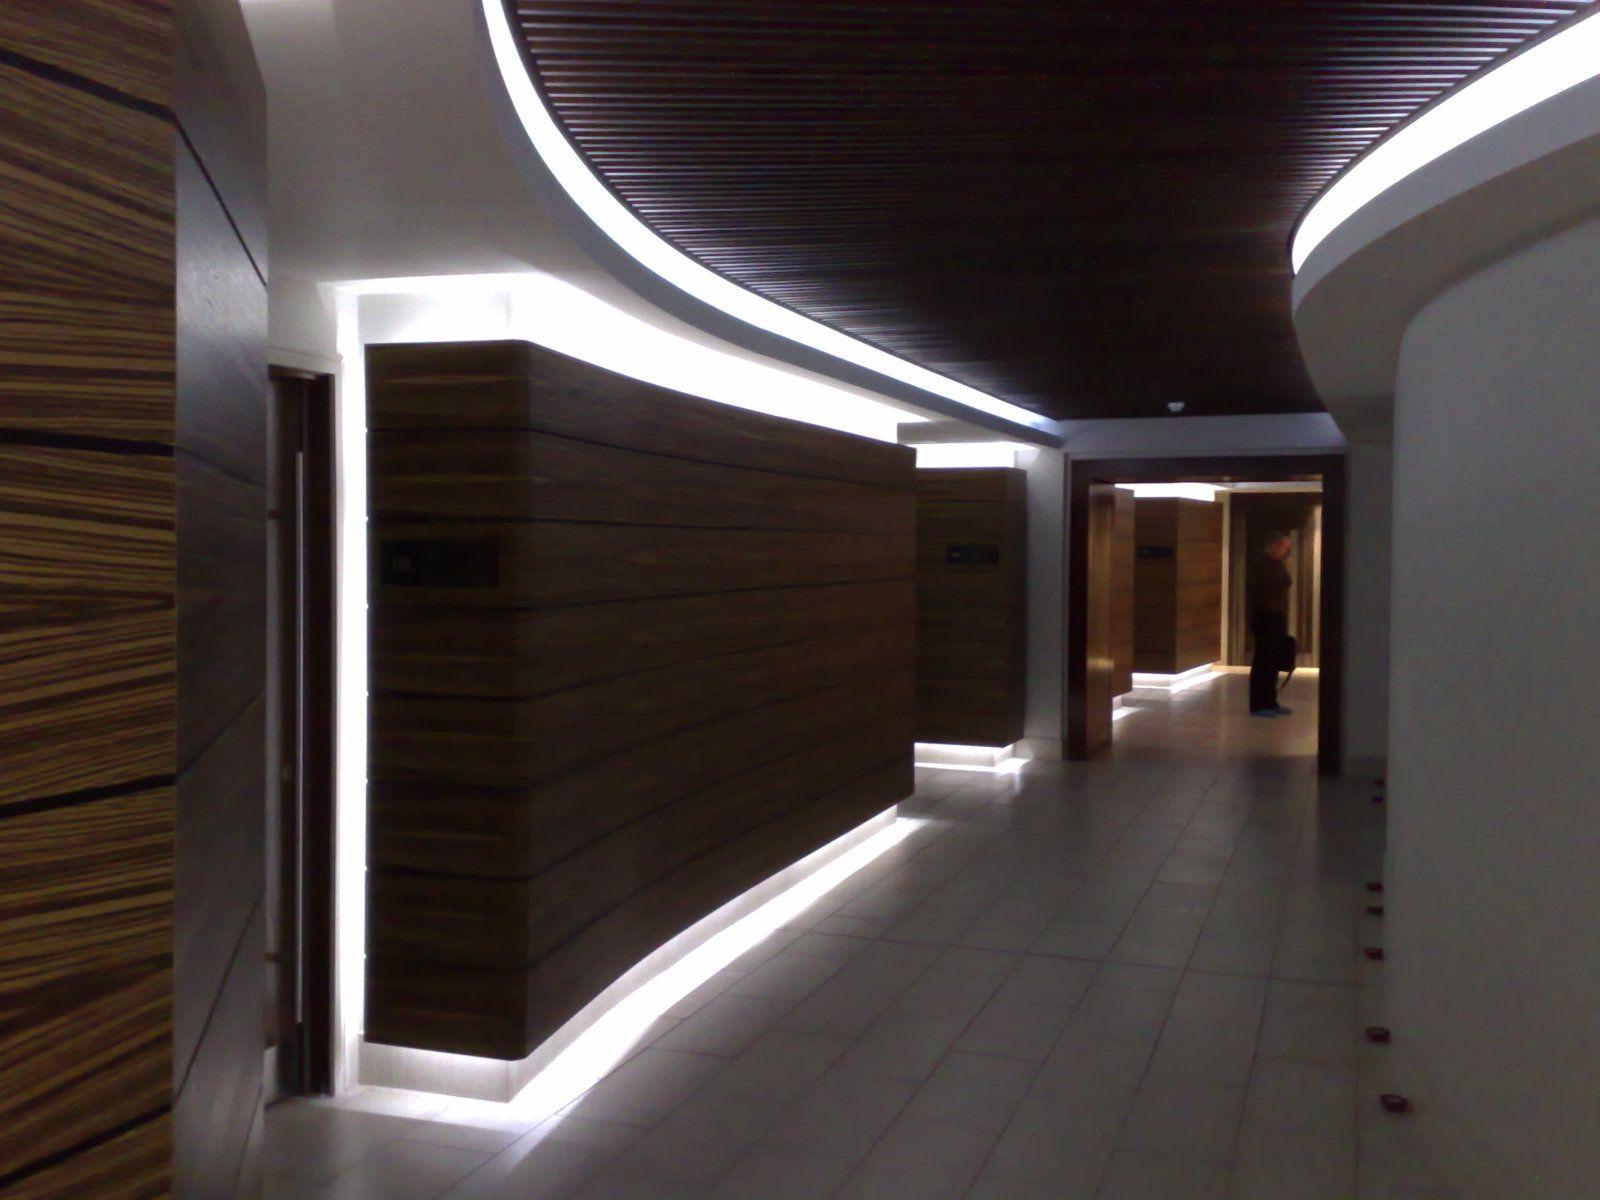 Leds 10 Uses In Architecture Led Outdoor Lighting Led Lighting Home Led Light Design